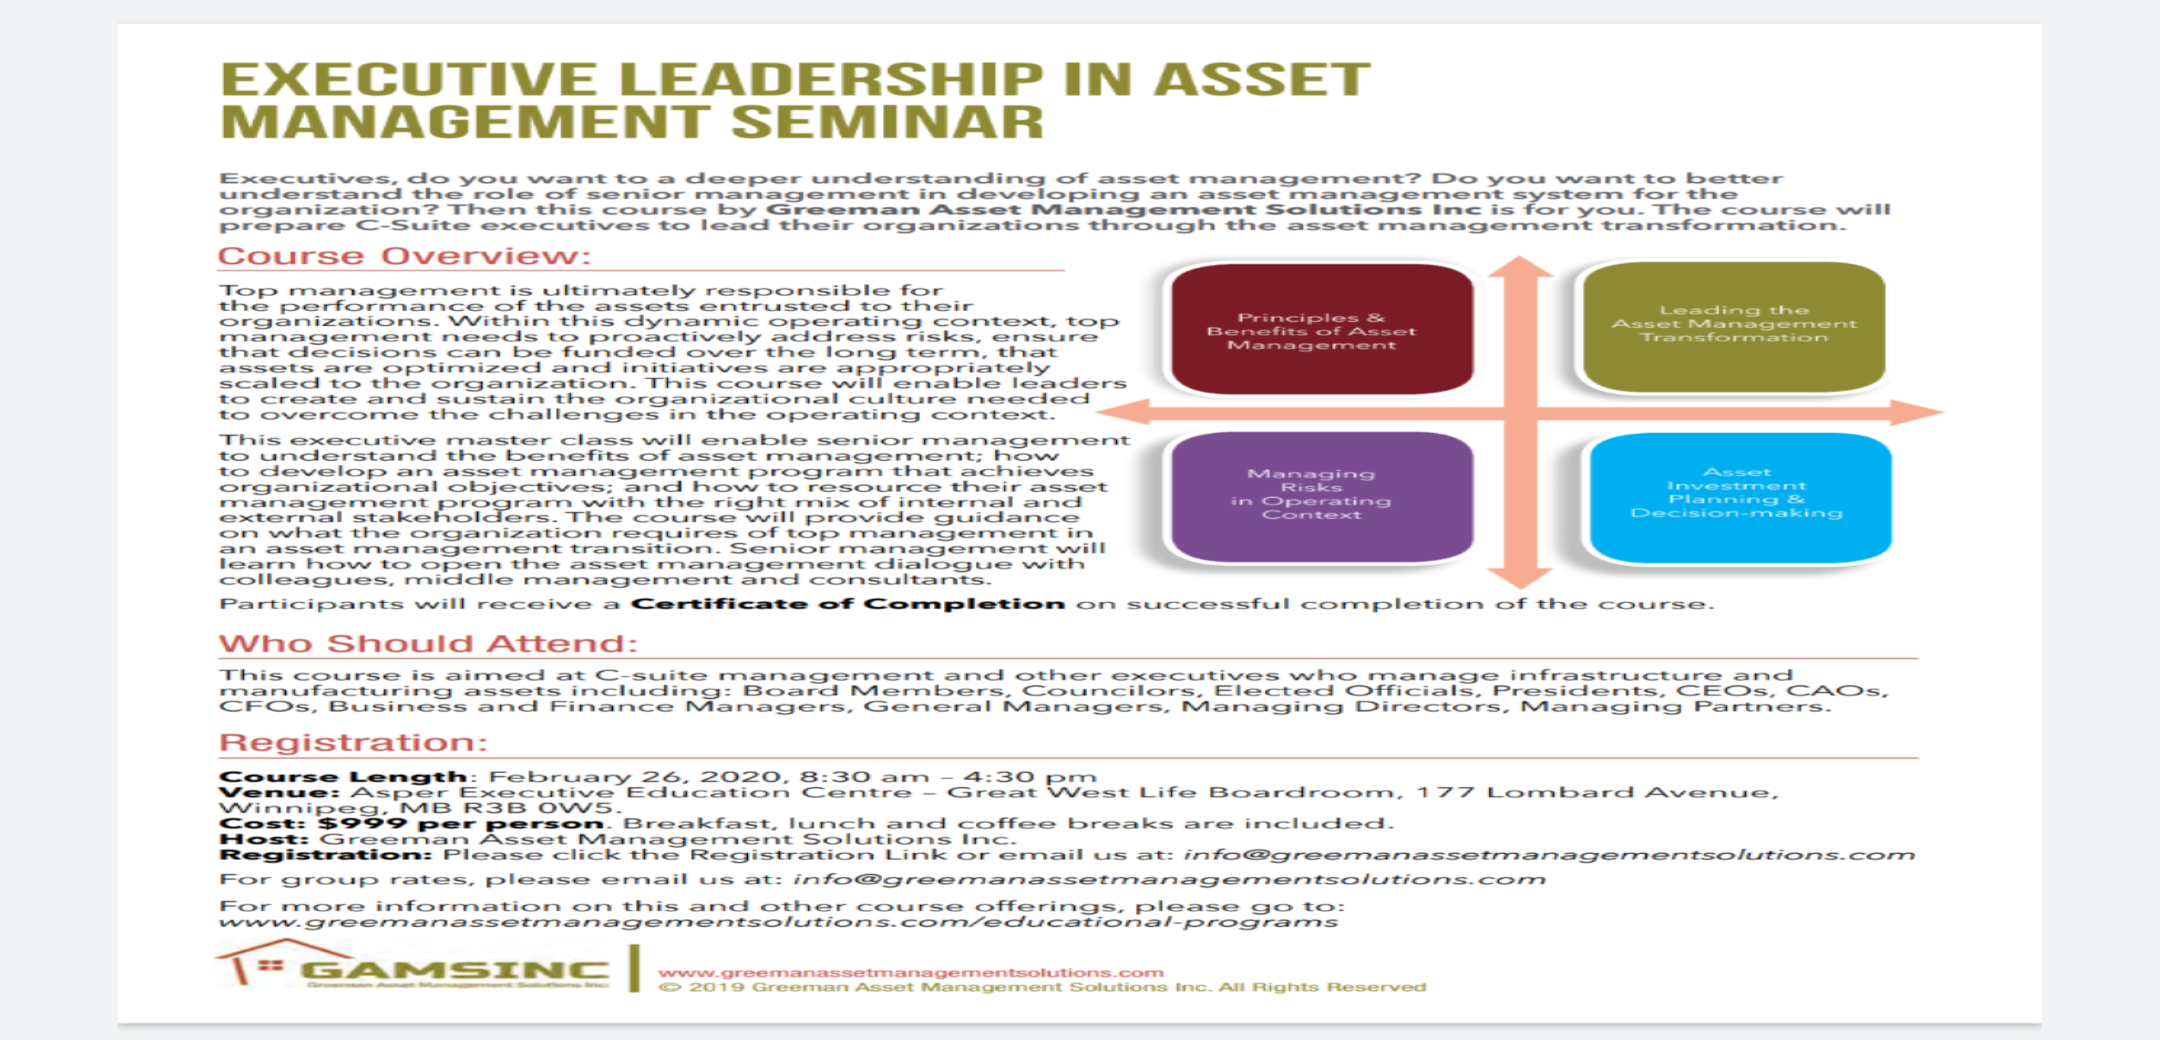 Executive Leadership in Asset Management Seminar